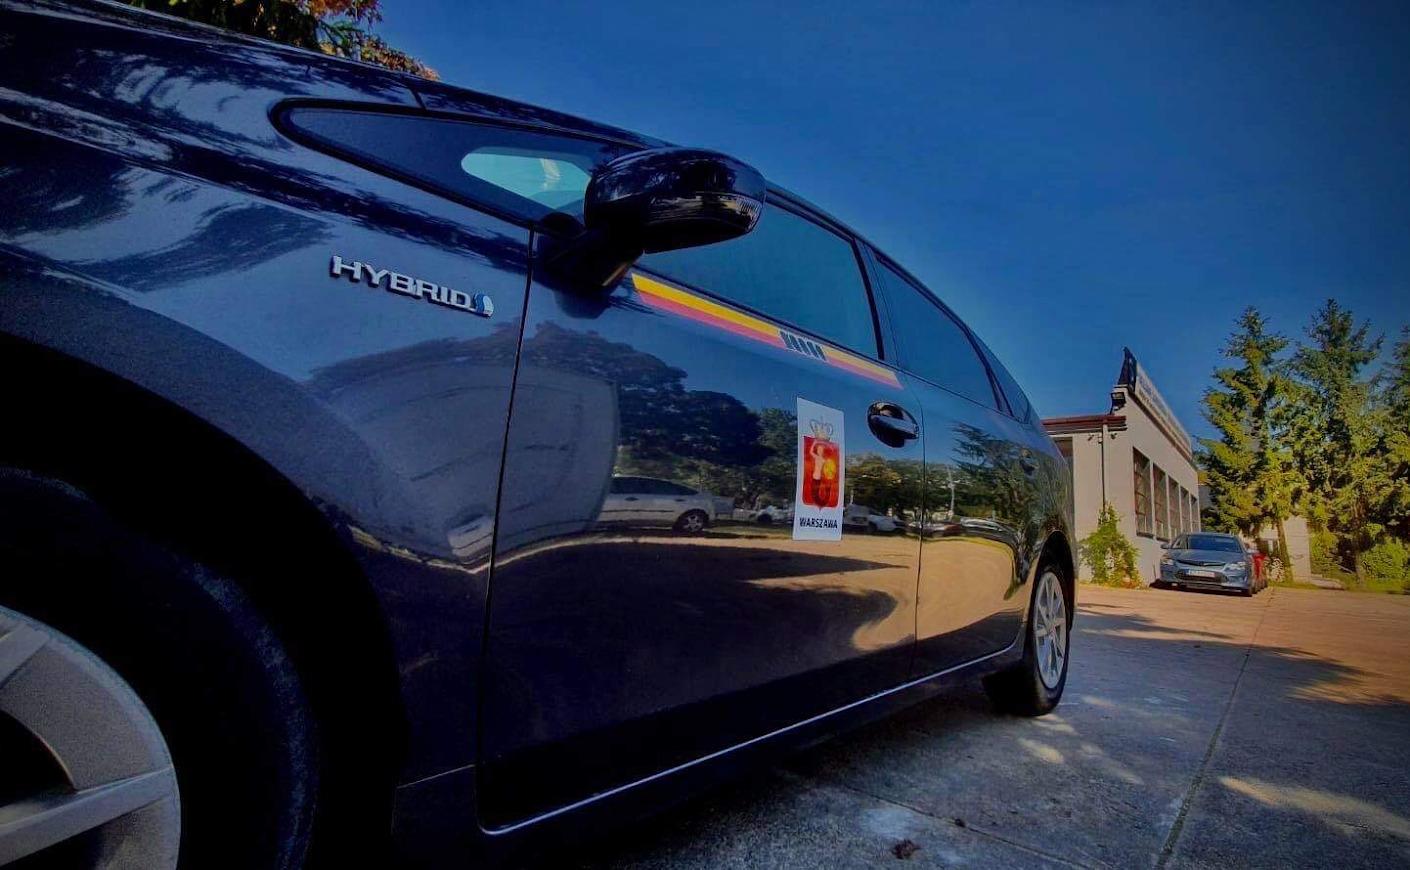 Ile zarabia taksówkarz?